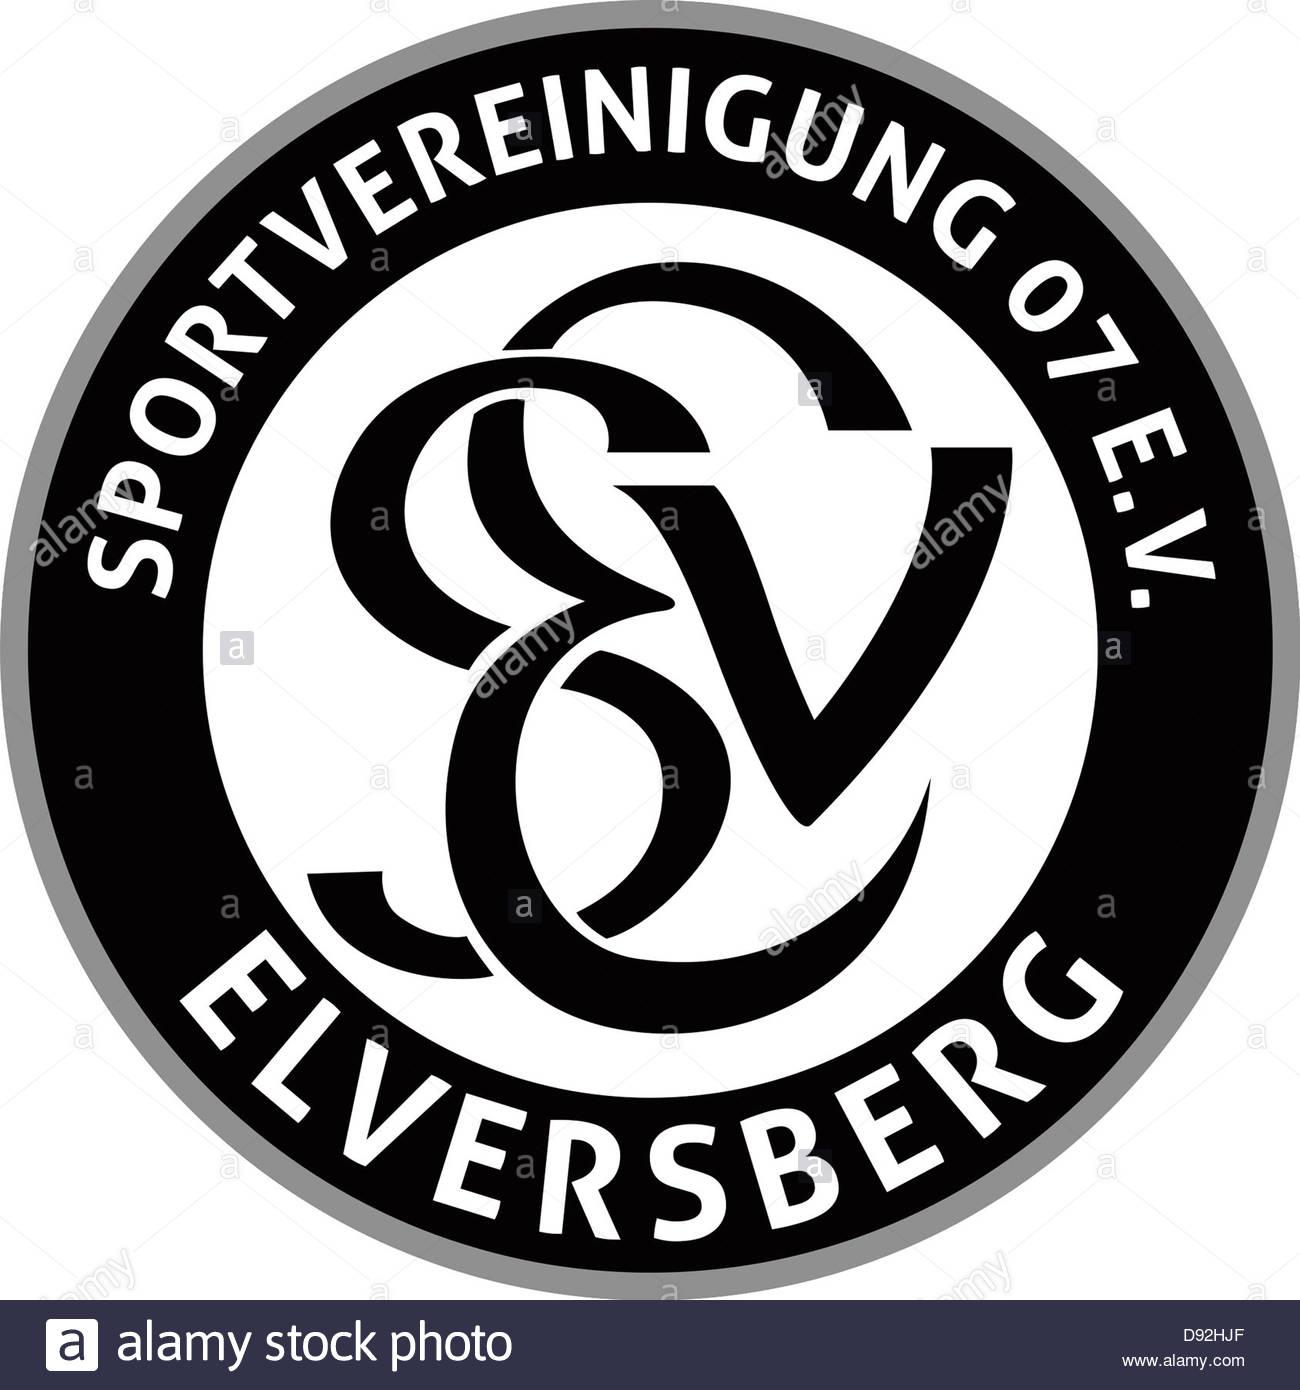 1300x1390 Logo Of German Football Team Sv 07 Elversberg Stock Photo, Royalty